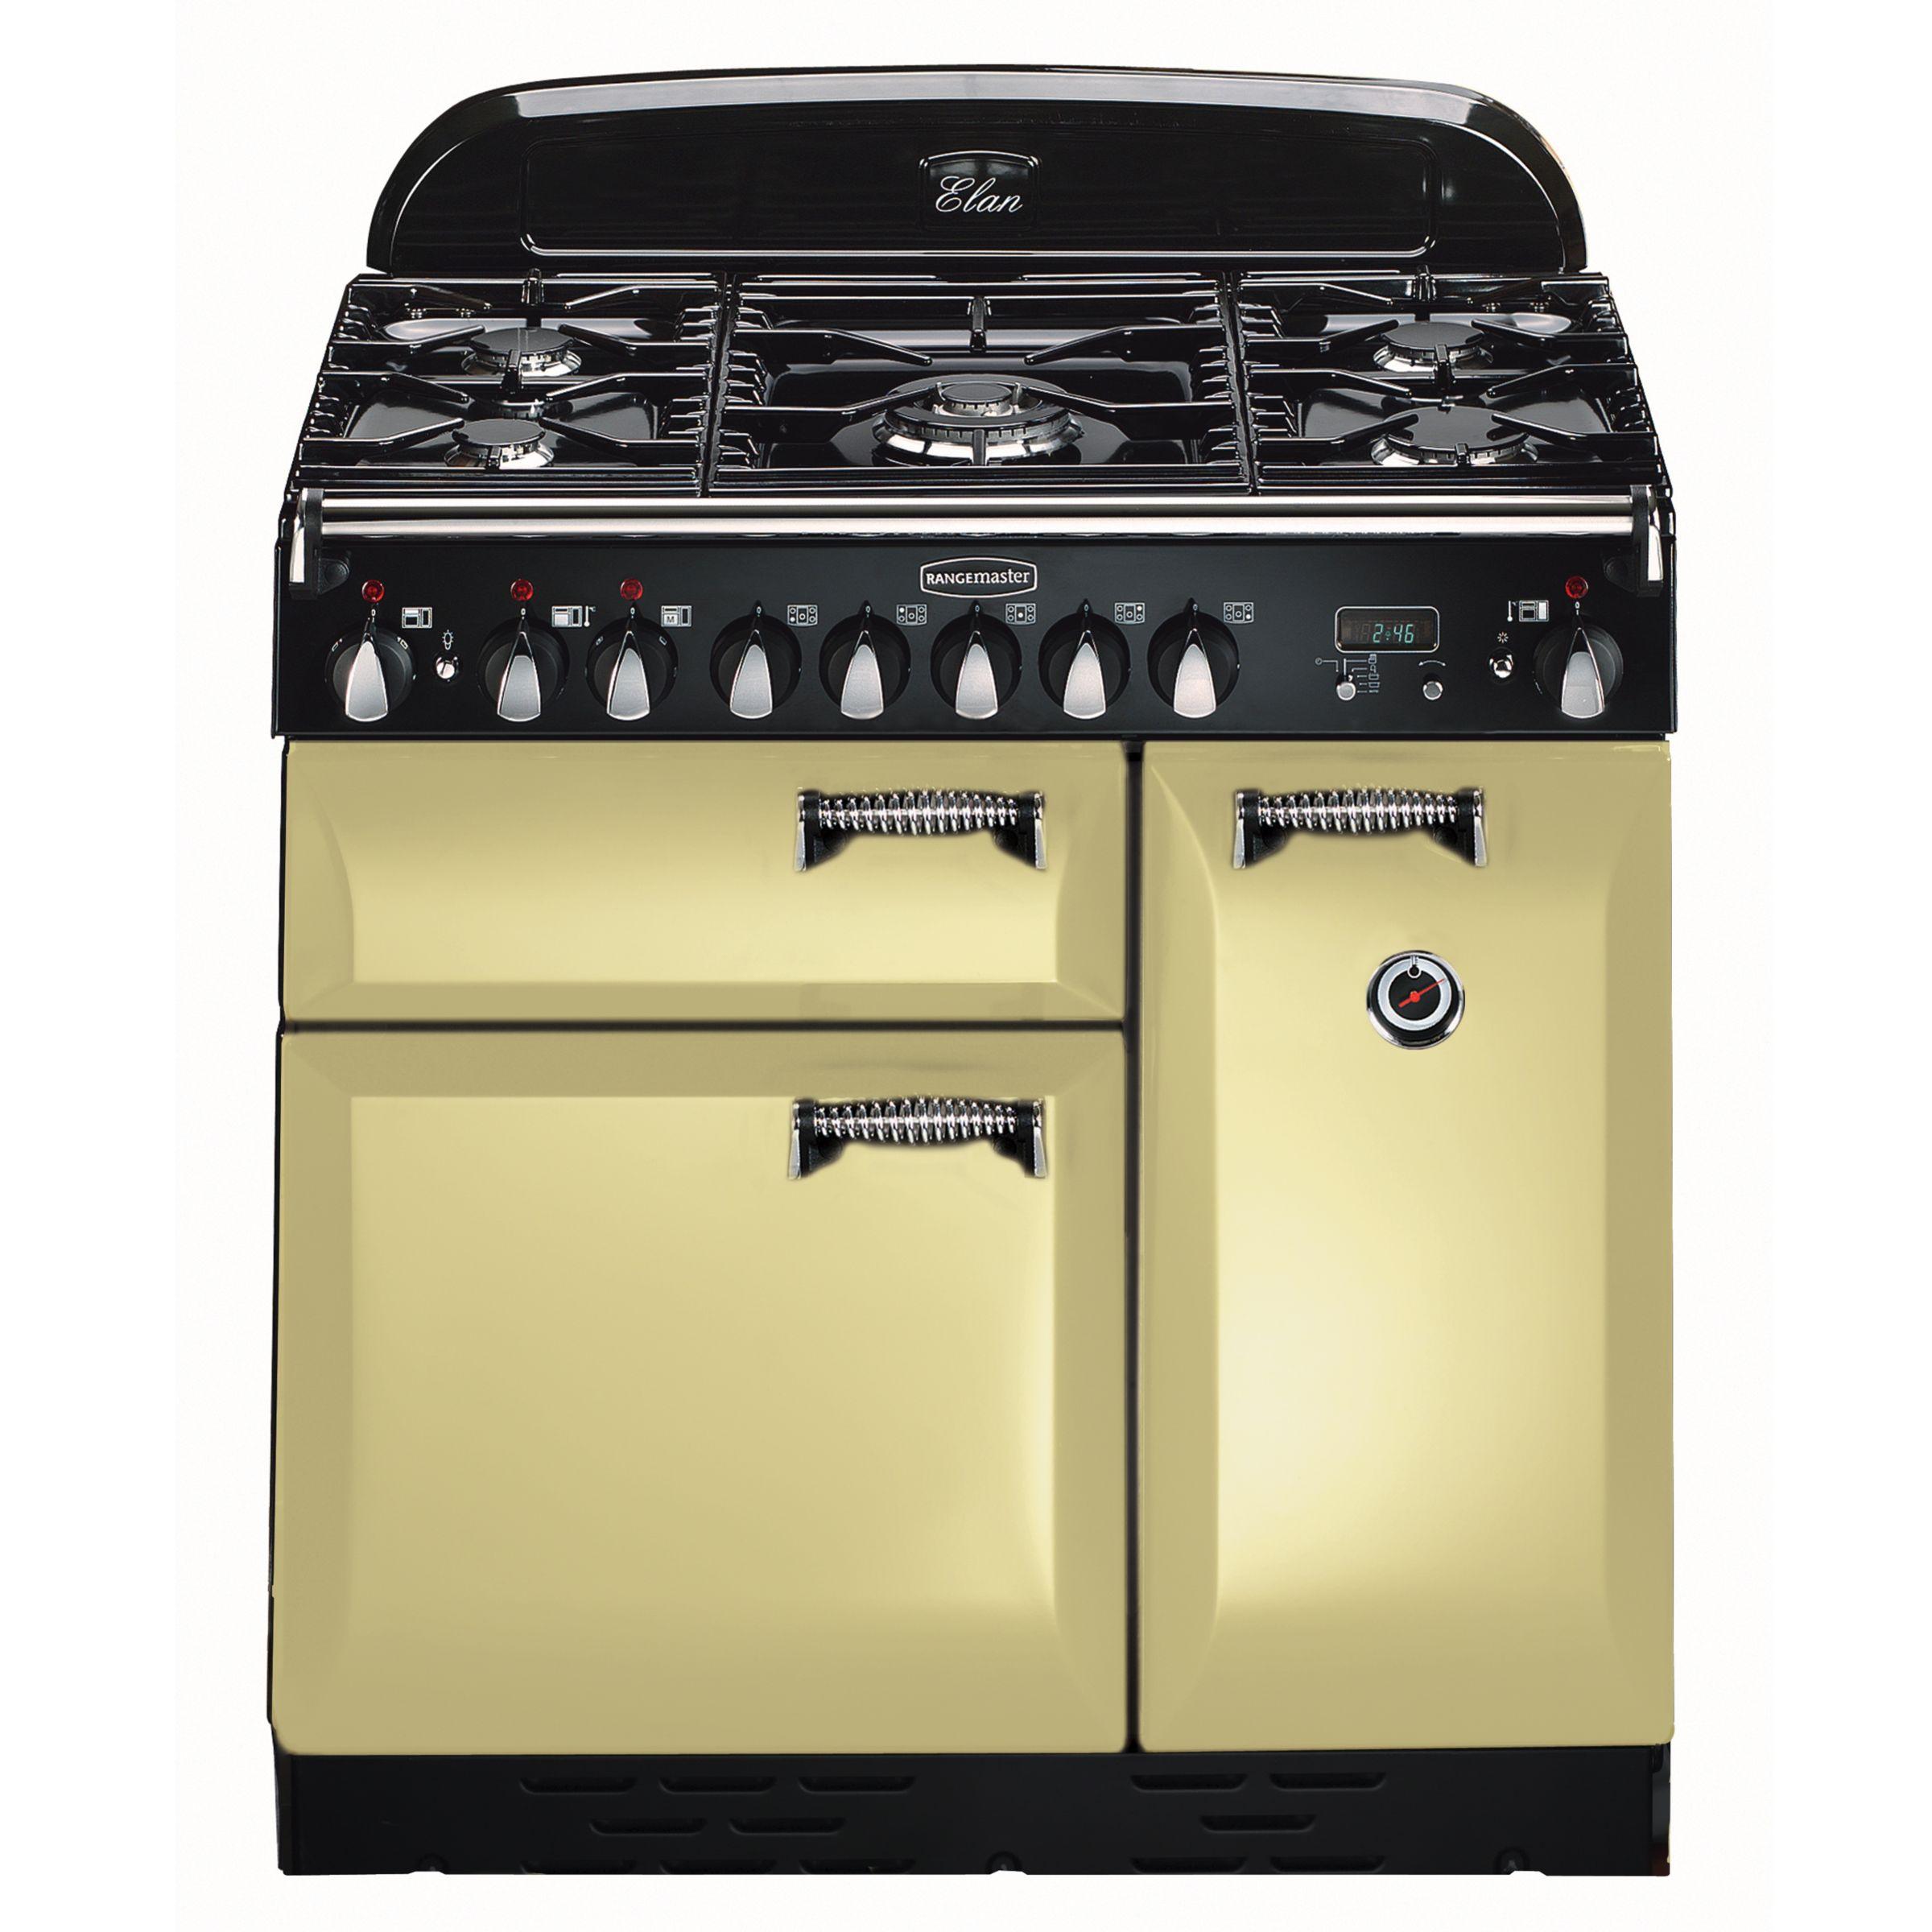 buy cheap rangemaster elan 90 dual fuel range cooker. Black Bedroom Furniture Sets. Home Design Ideas